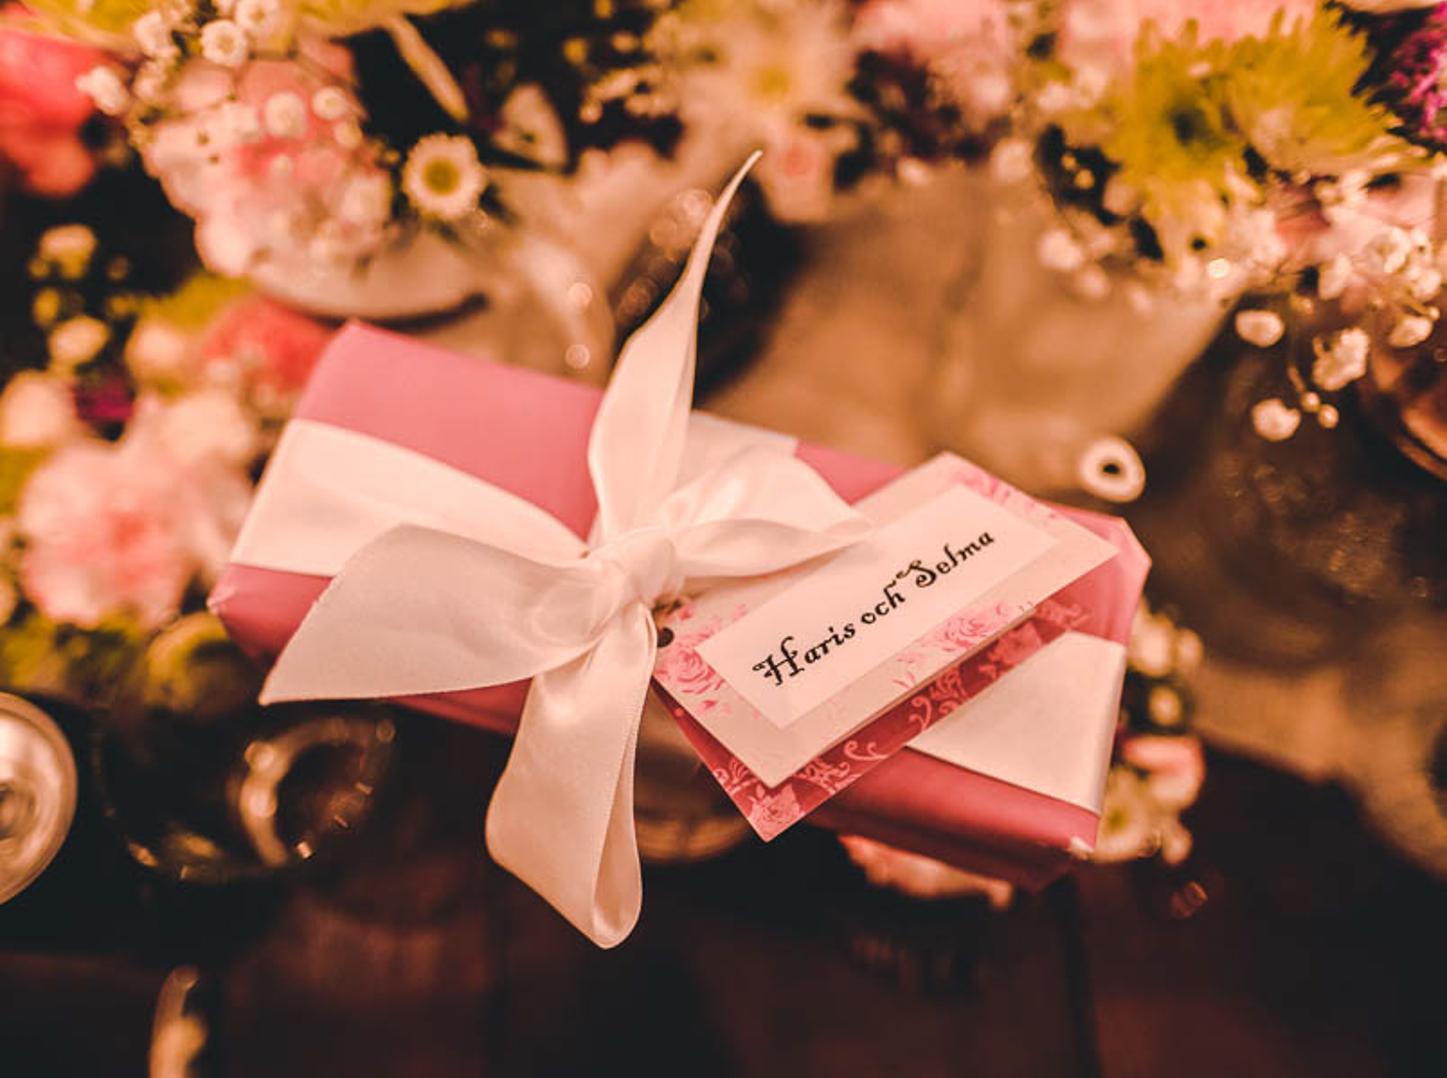 bodas-sin-clasificar-sin-tema-cuba-42412.jpg